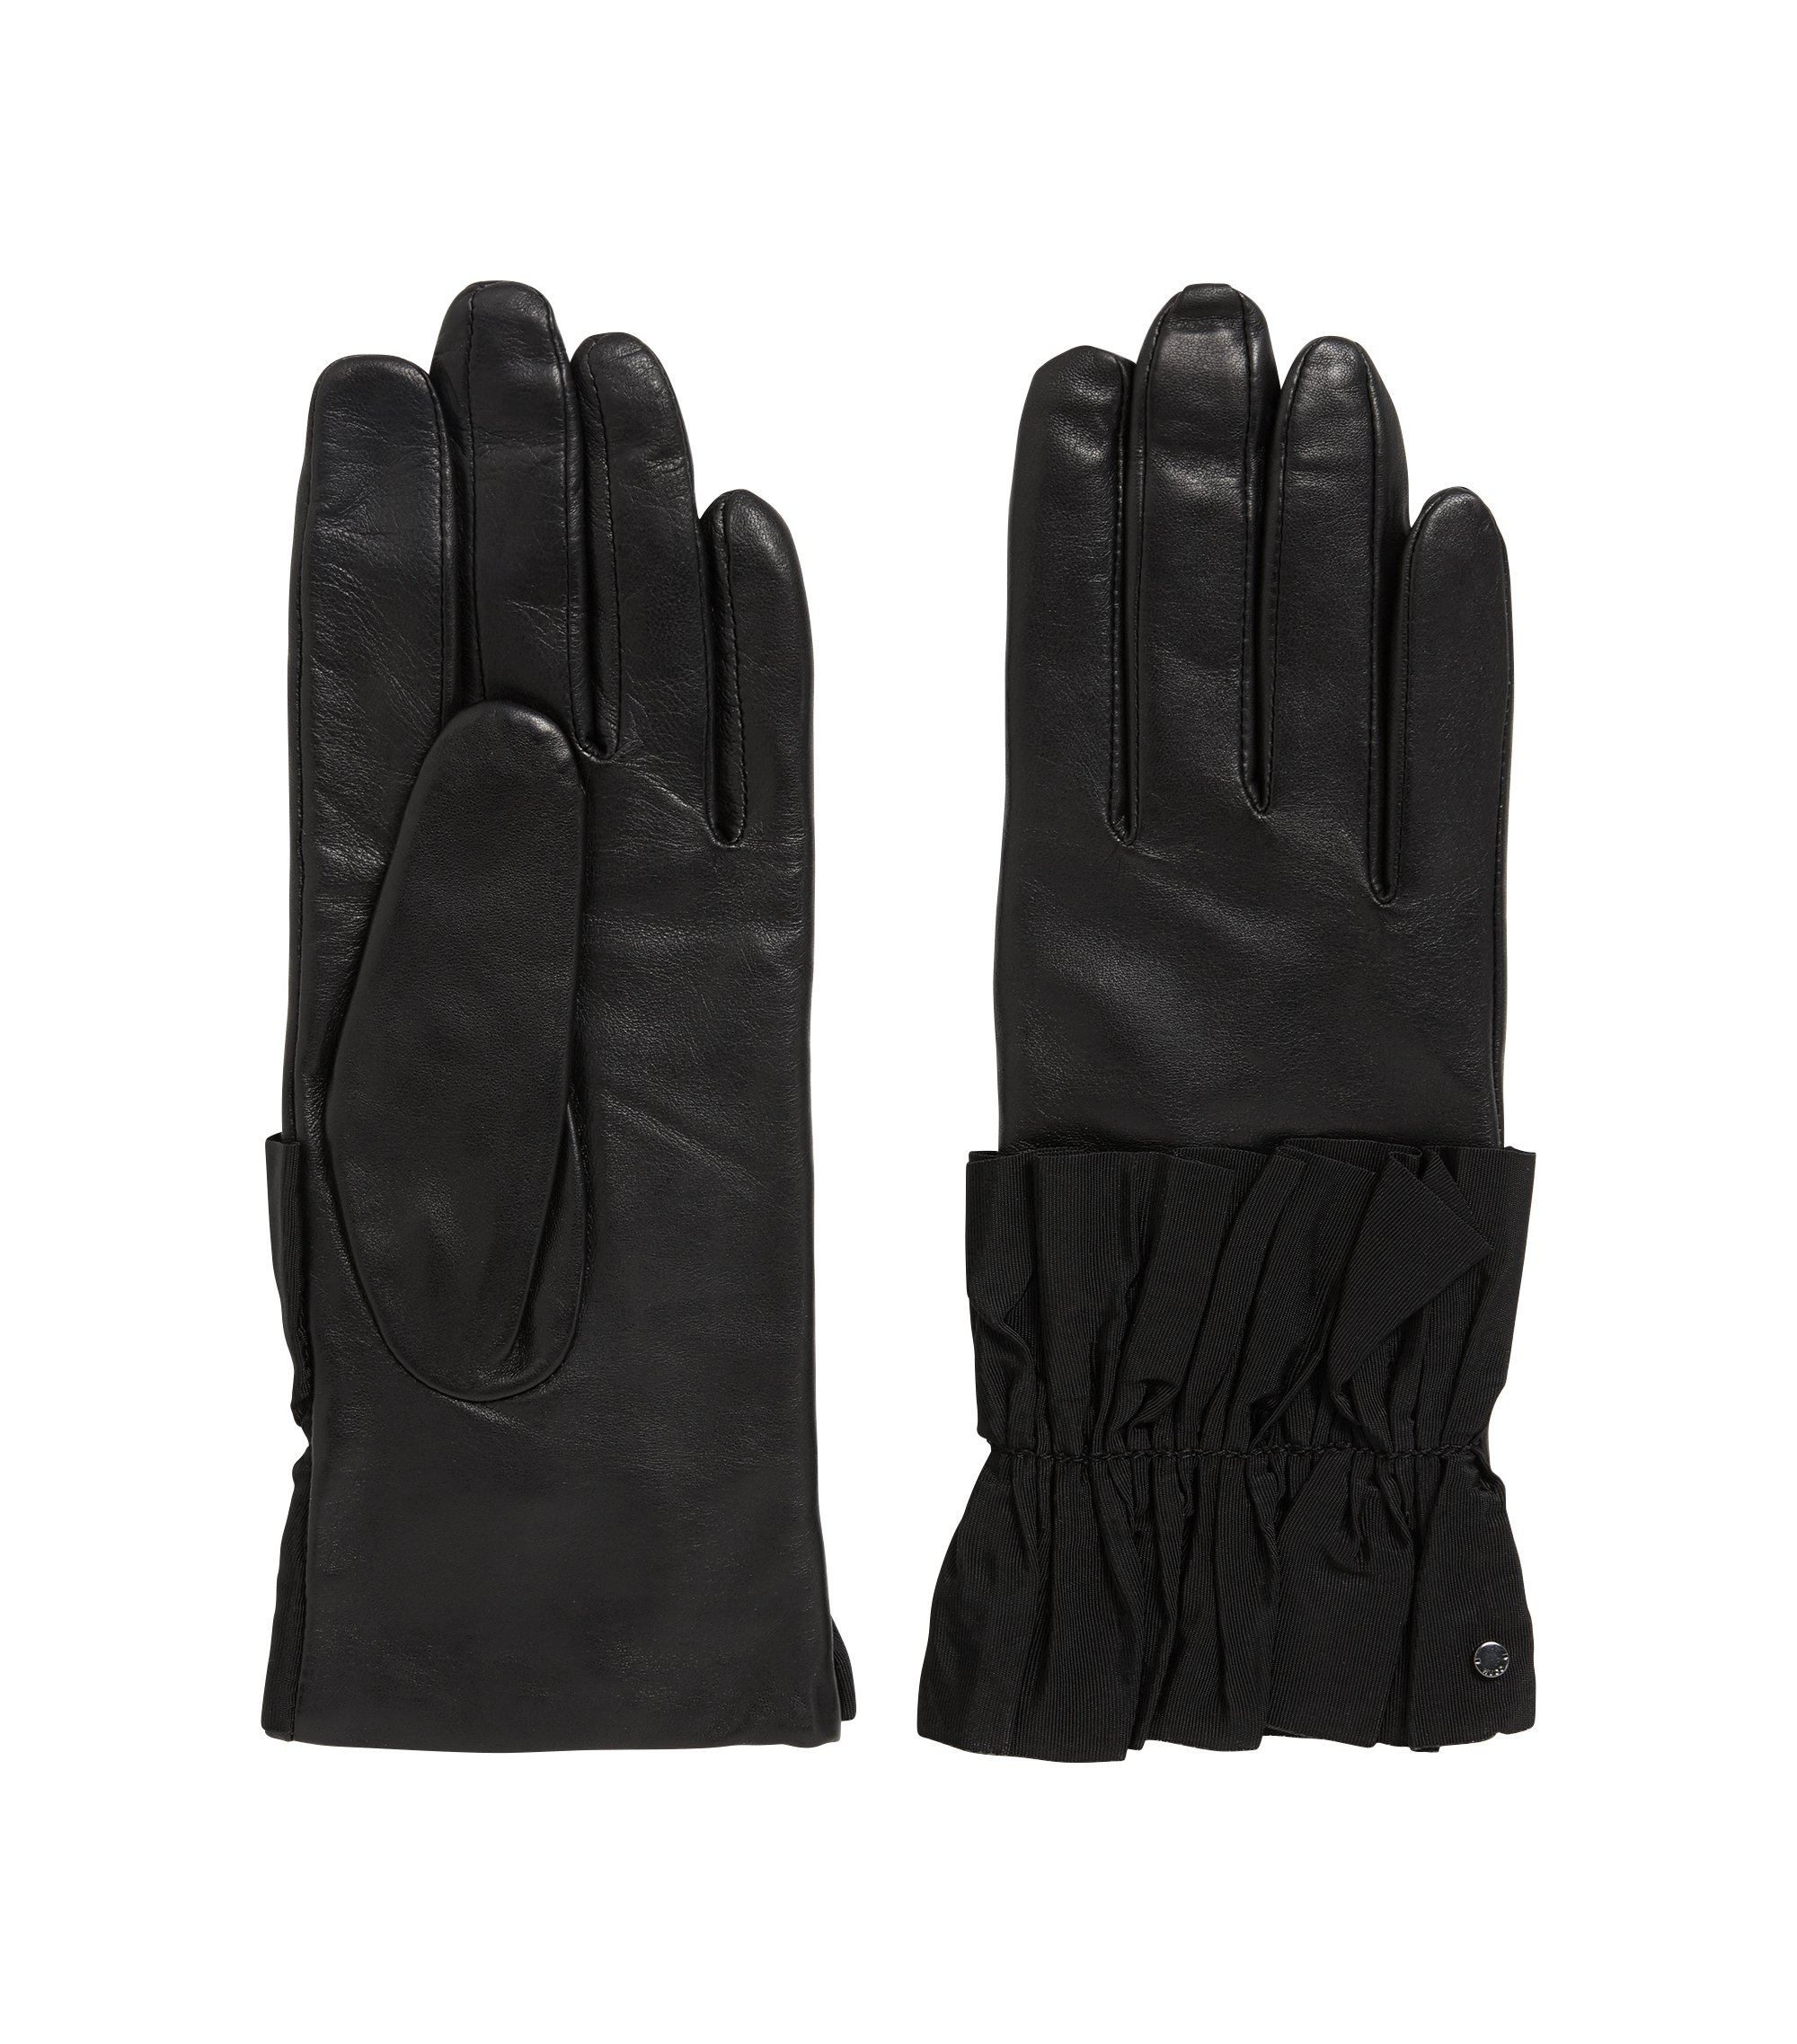 Lederhandschuhe mit gerüschten Bündchen, Schwarz